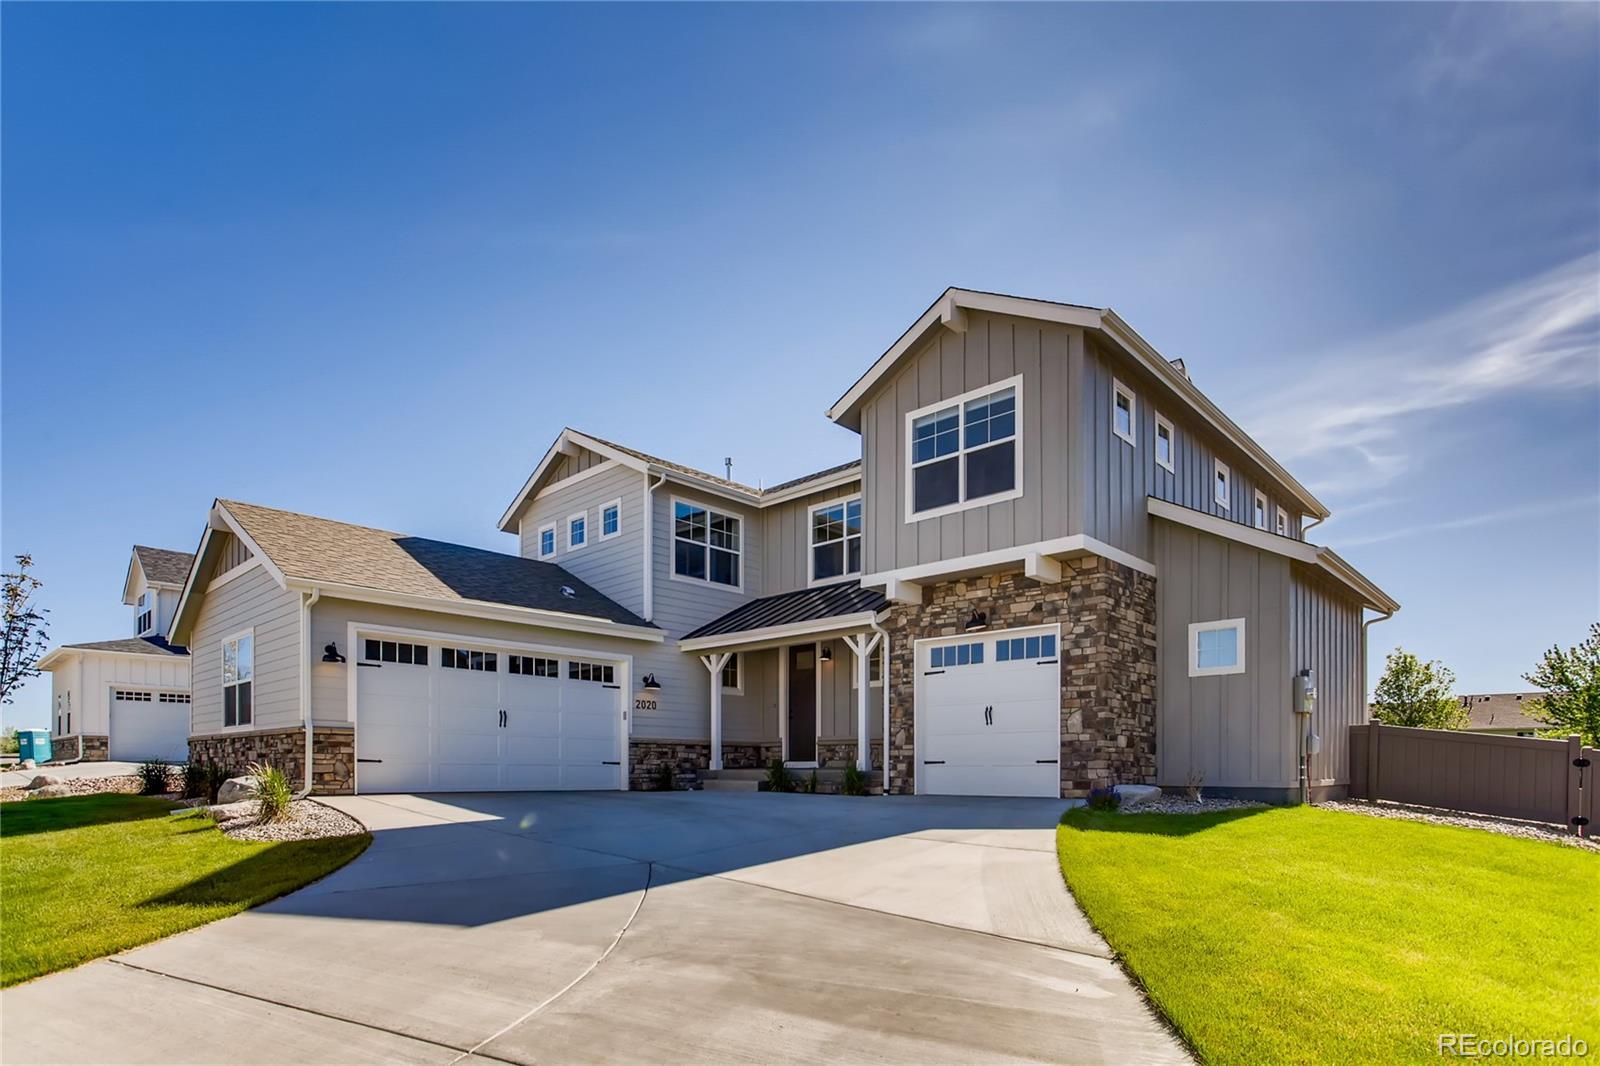 2020 Cuda Court Property Photo - Berthoud, CO real estate listing